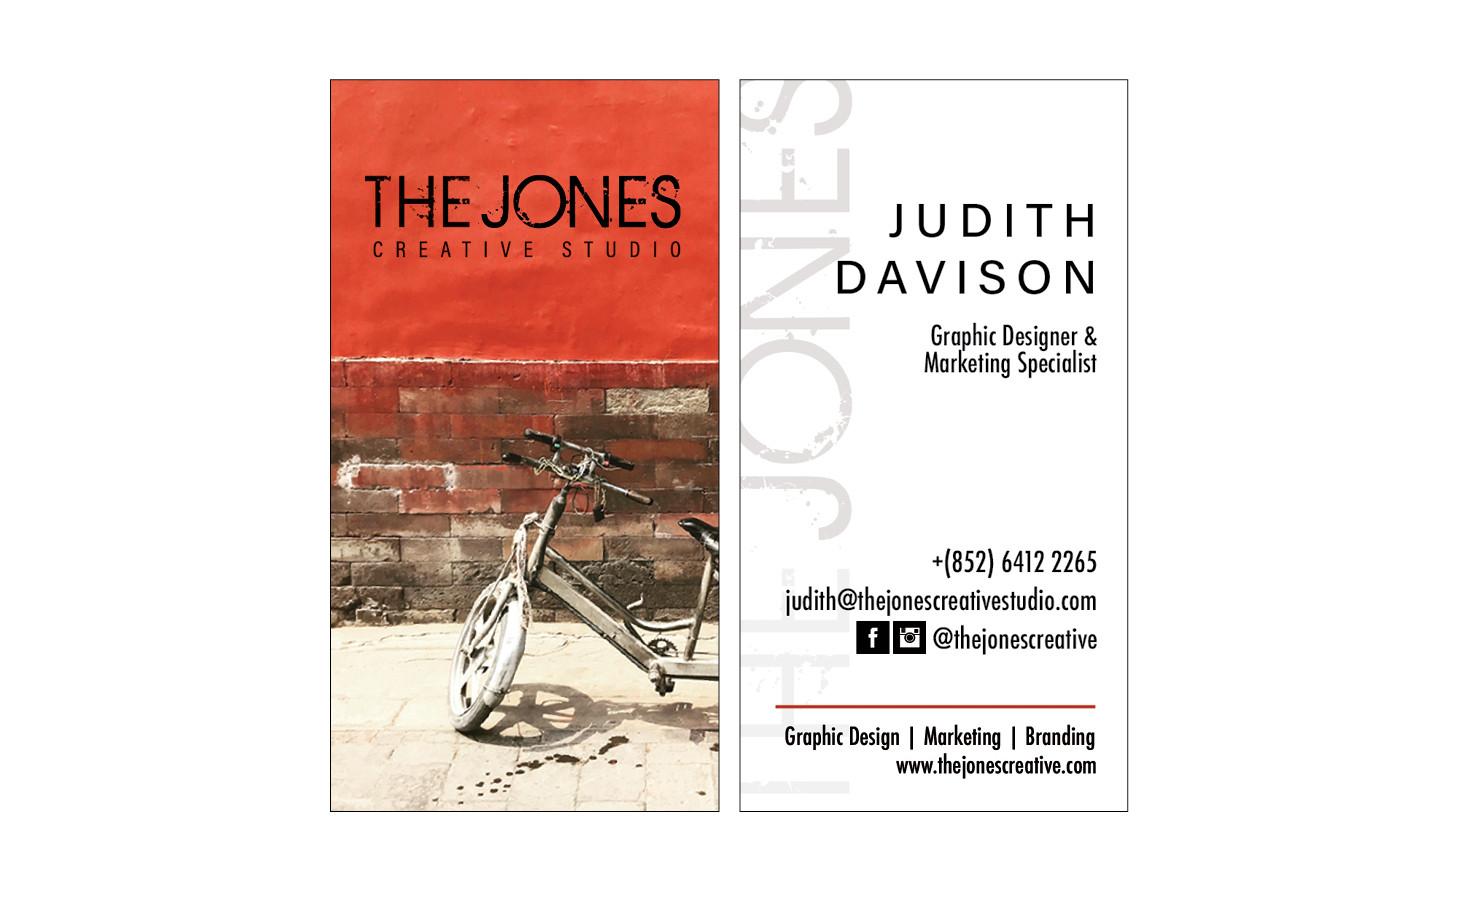 The Jones Creative Studio